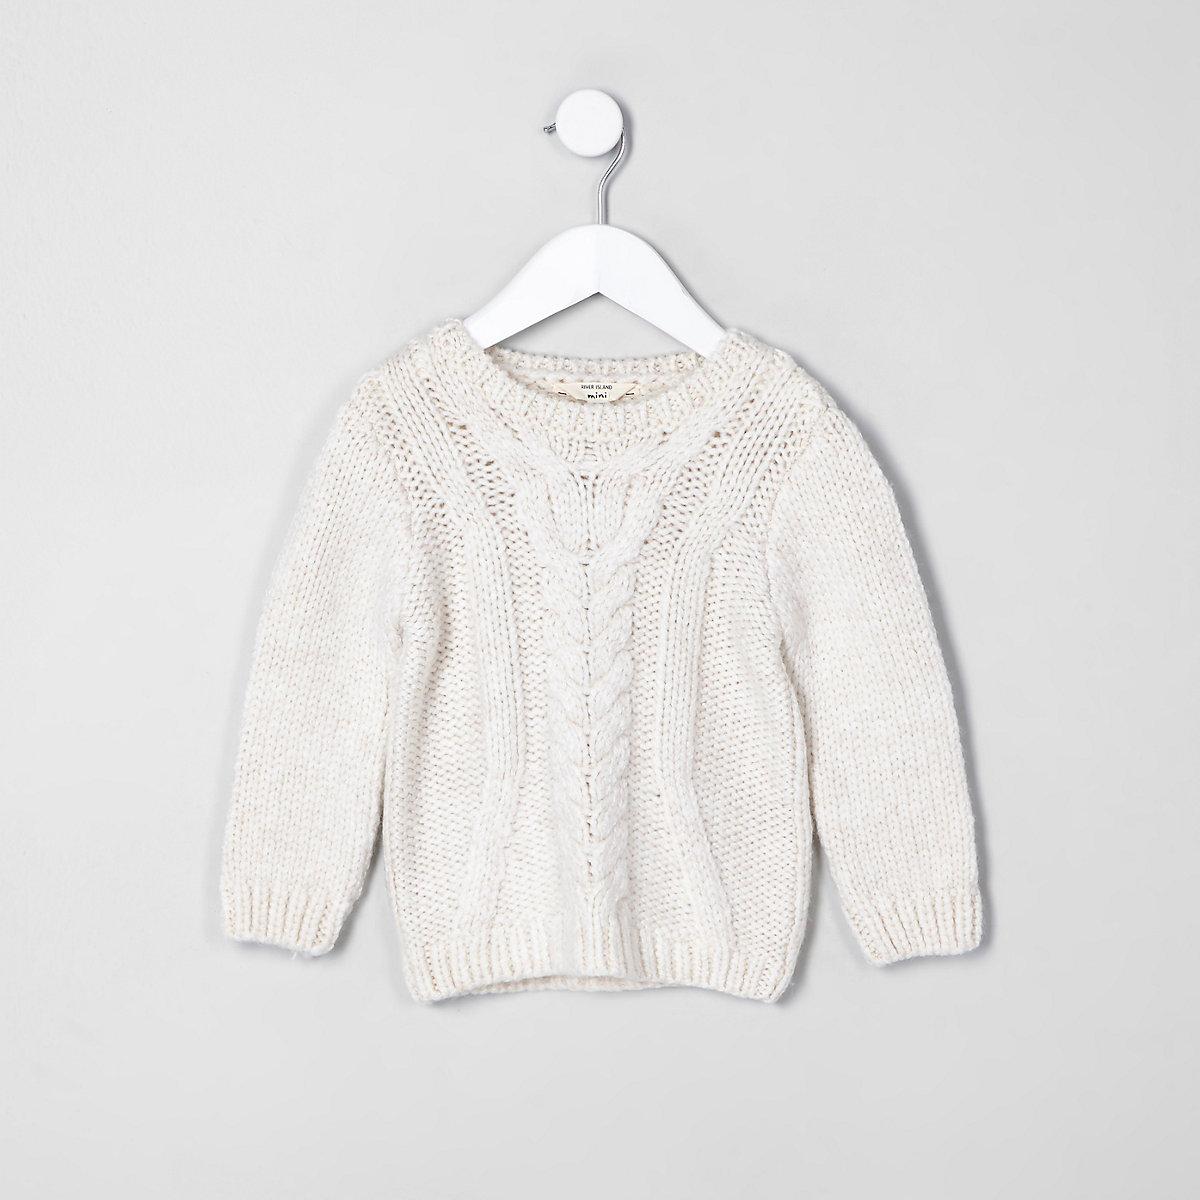 8edd6968d Mini boys ecru chunky cable knit sweater - Baby Boys Tops - Mini ...